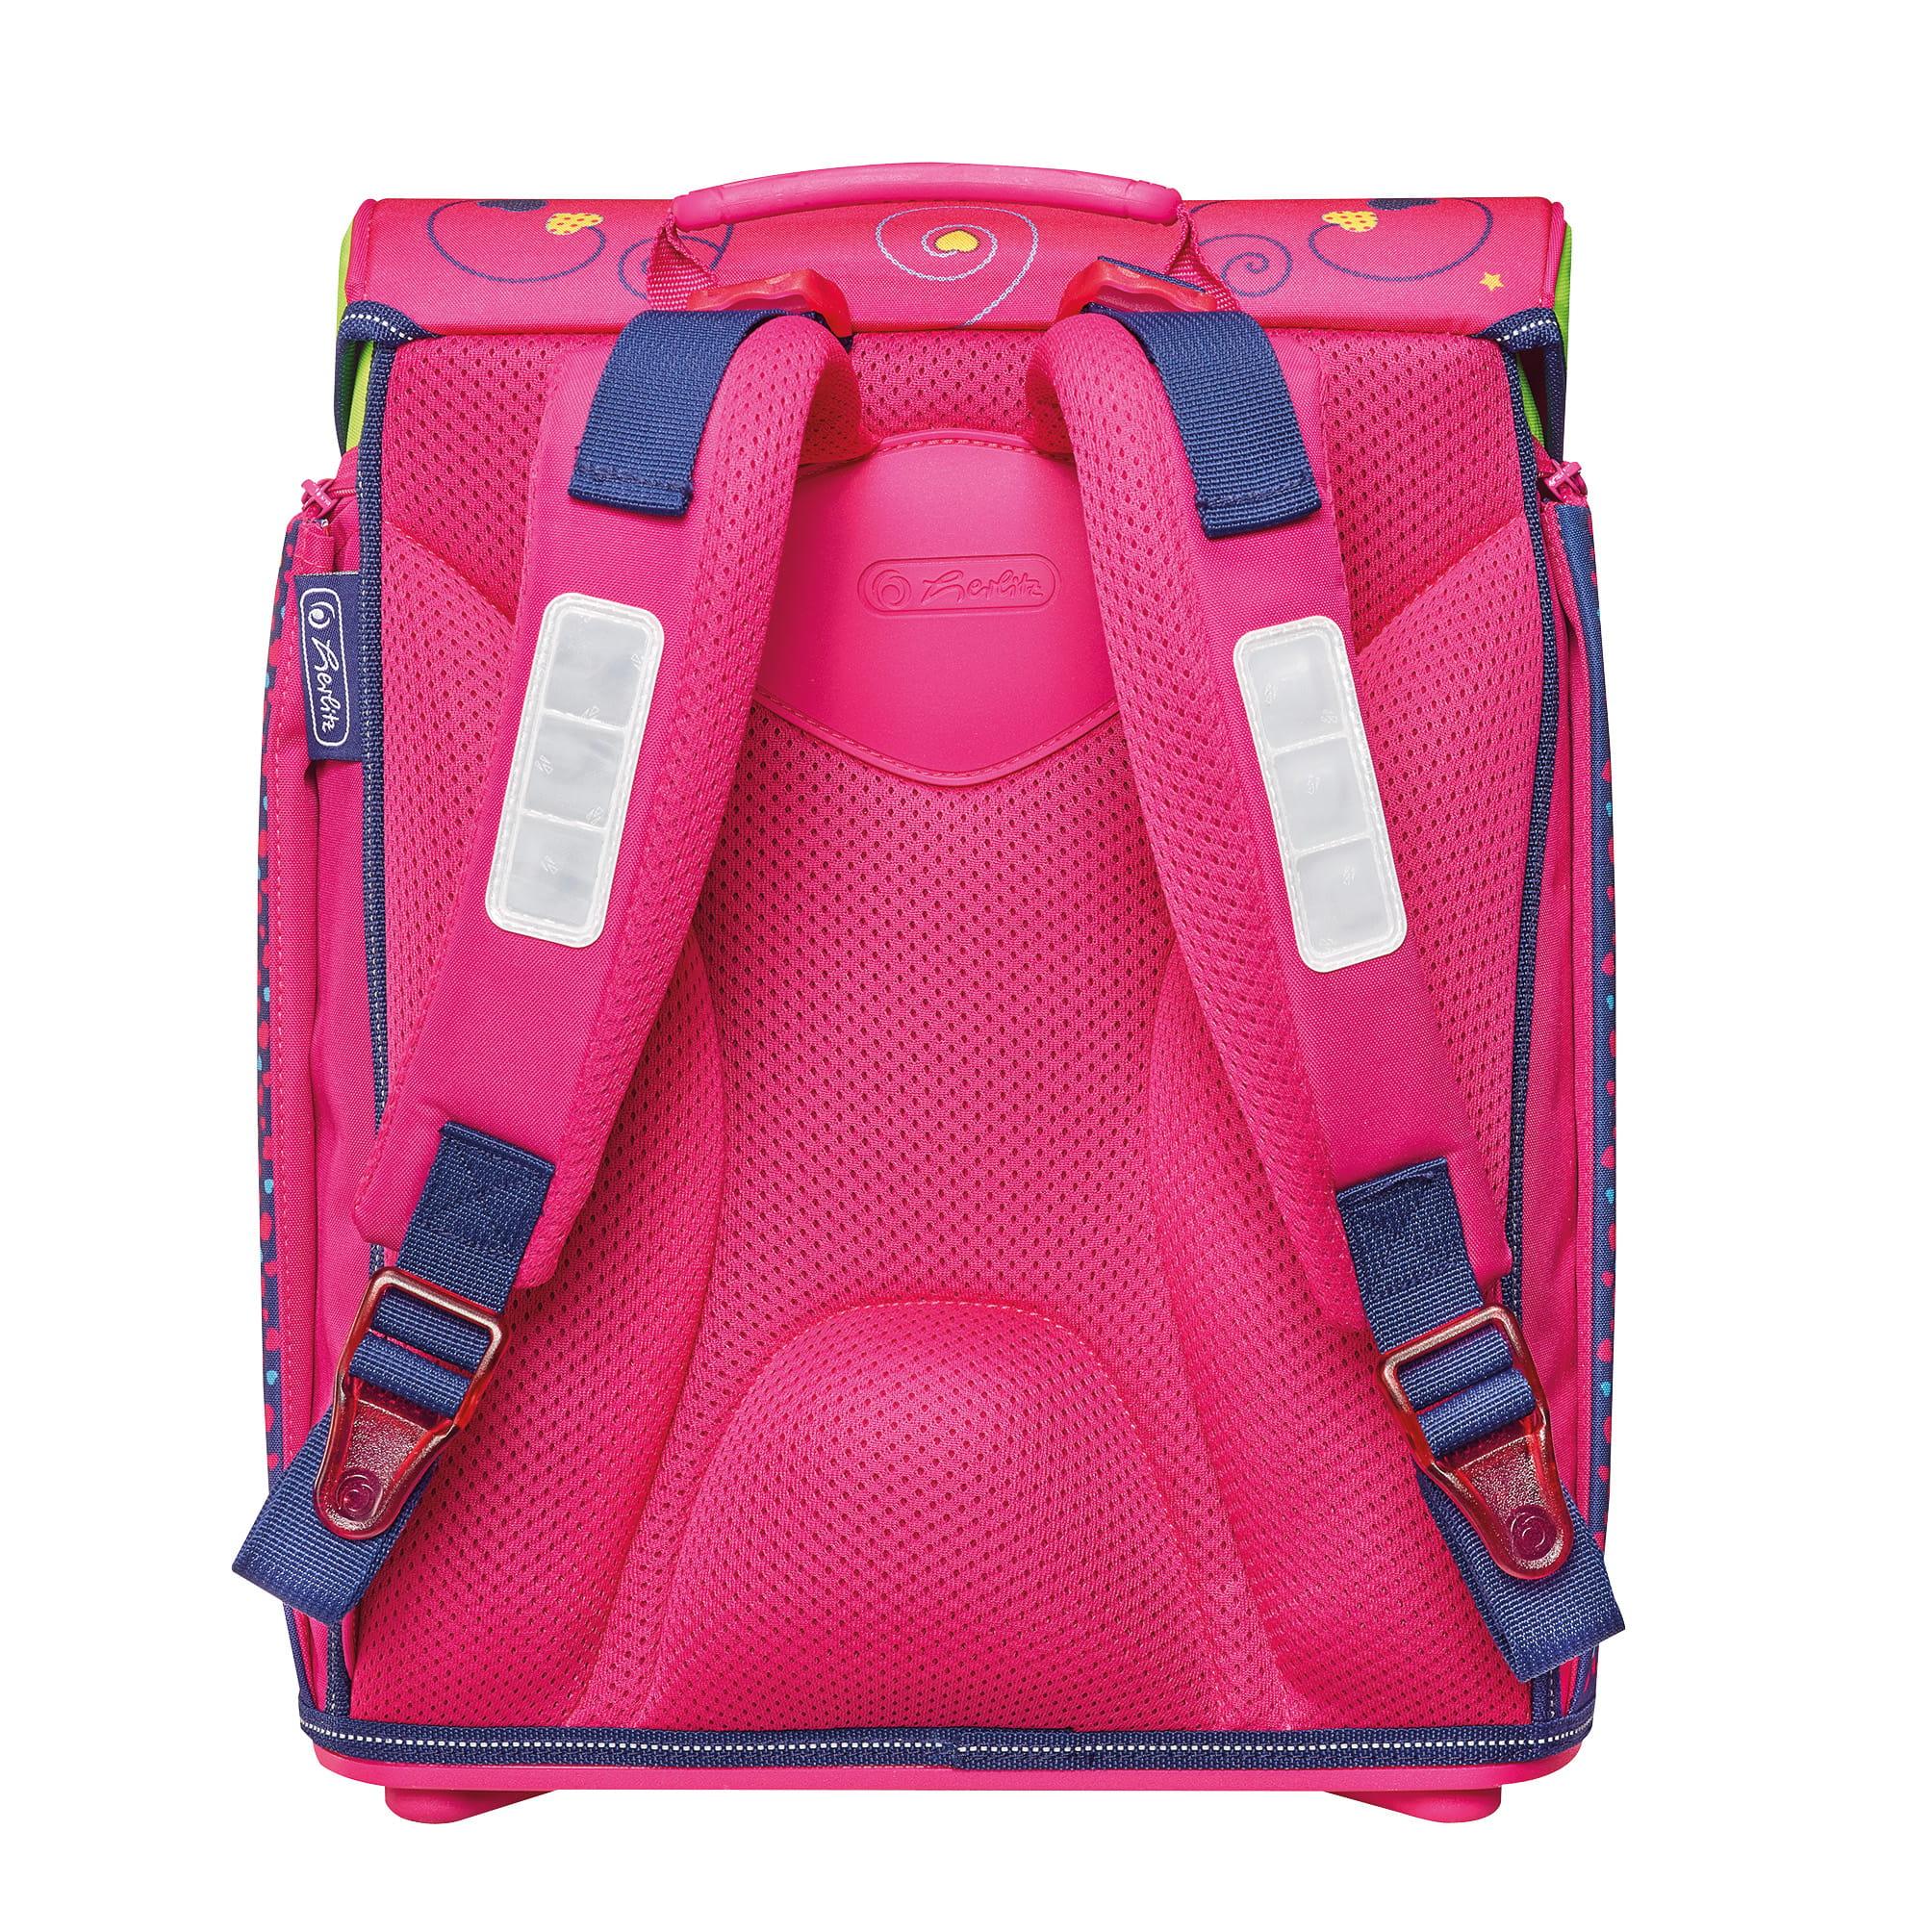 0e7d28ec73d2f Tornister Herlitz Midi Plus Pink Hearts 4w1. 50013715P141.jpg. promocja.  50013715P141.jpg · 50013715P142.jpg · 50013715P143.jpg ...